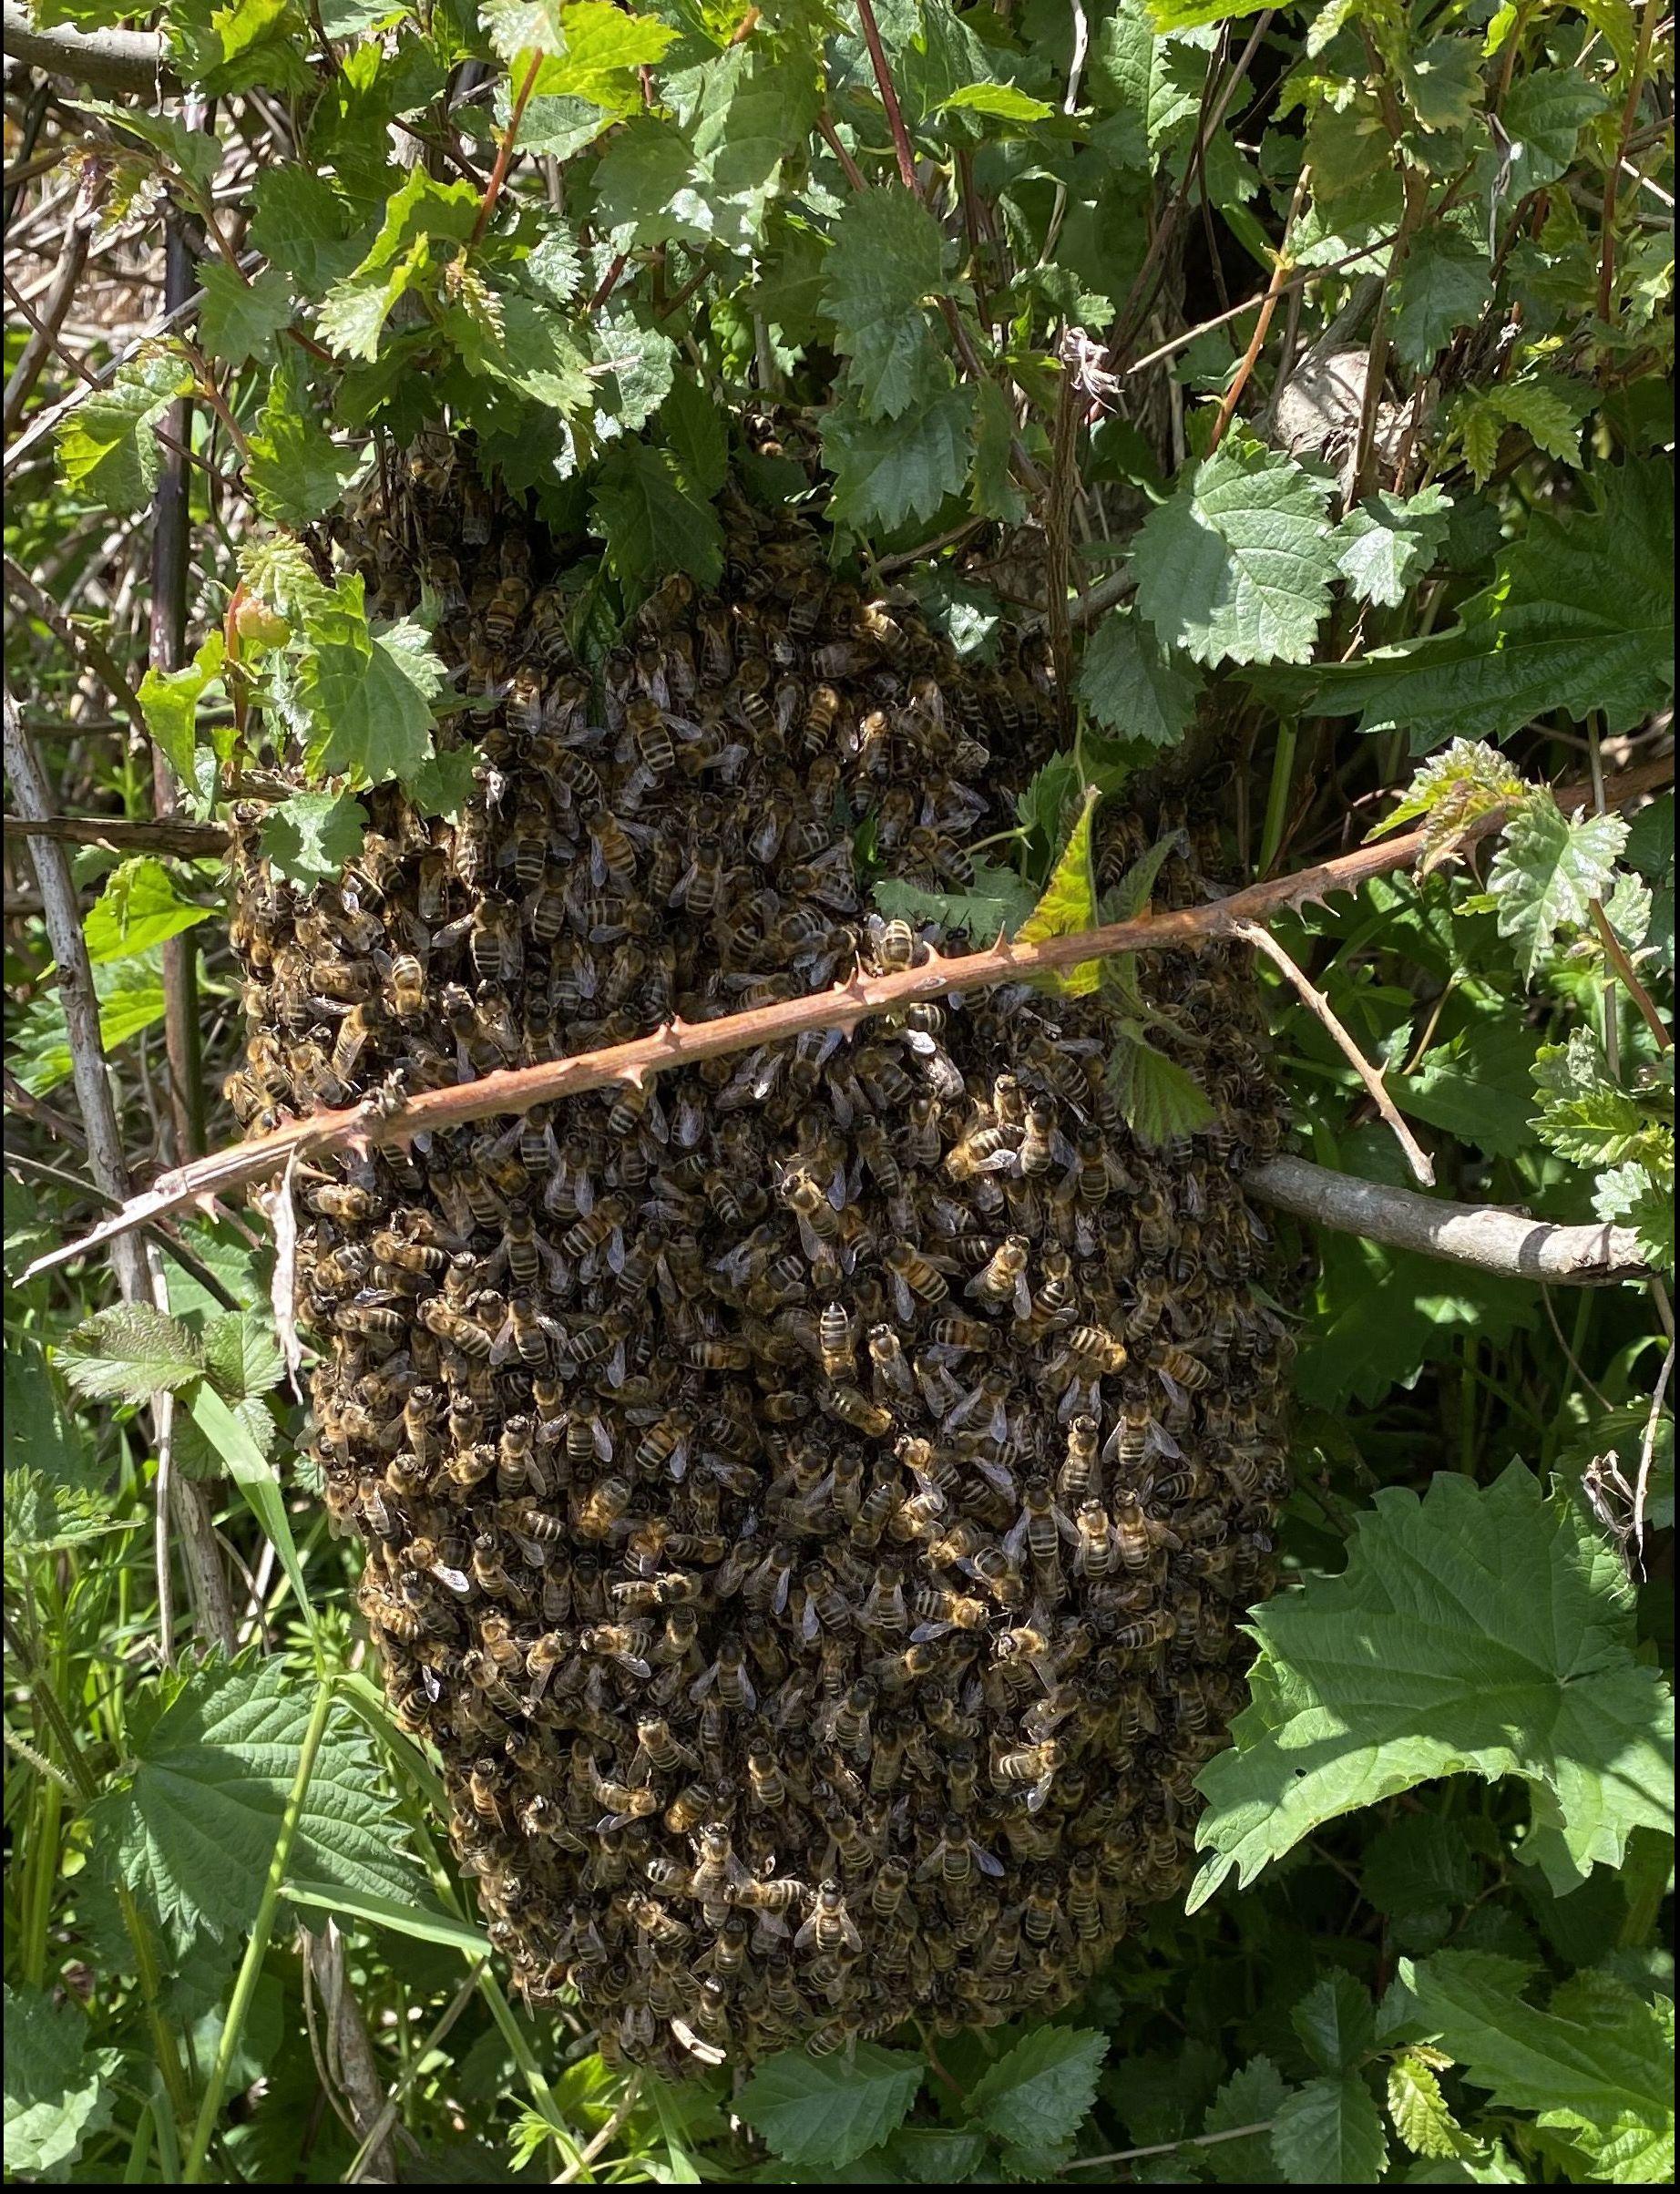 swarm bhg 210512